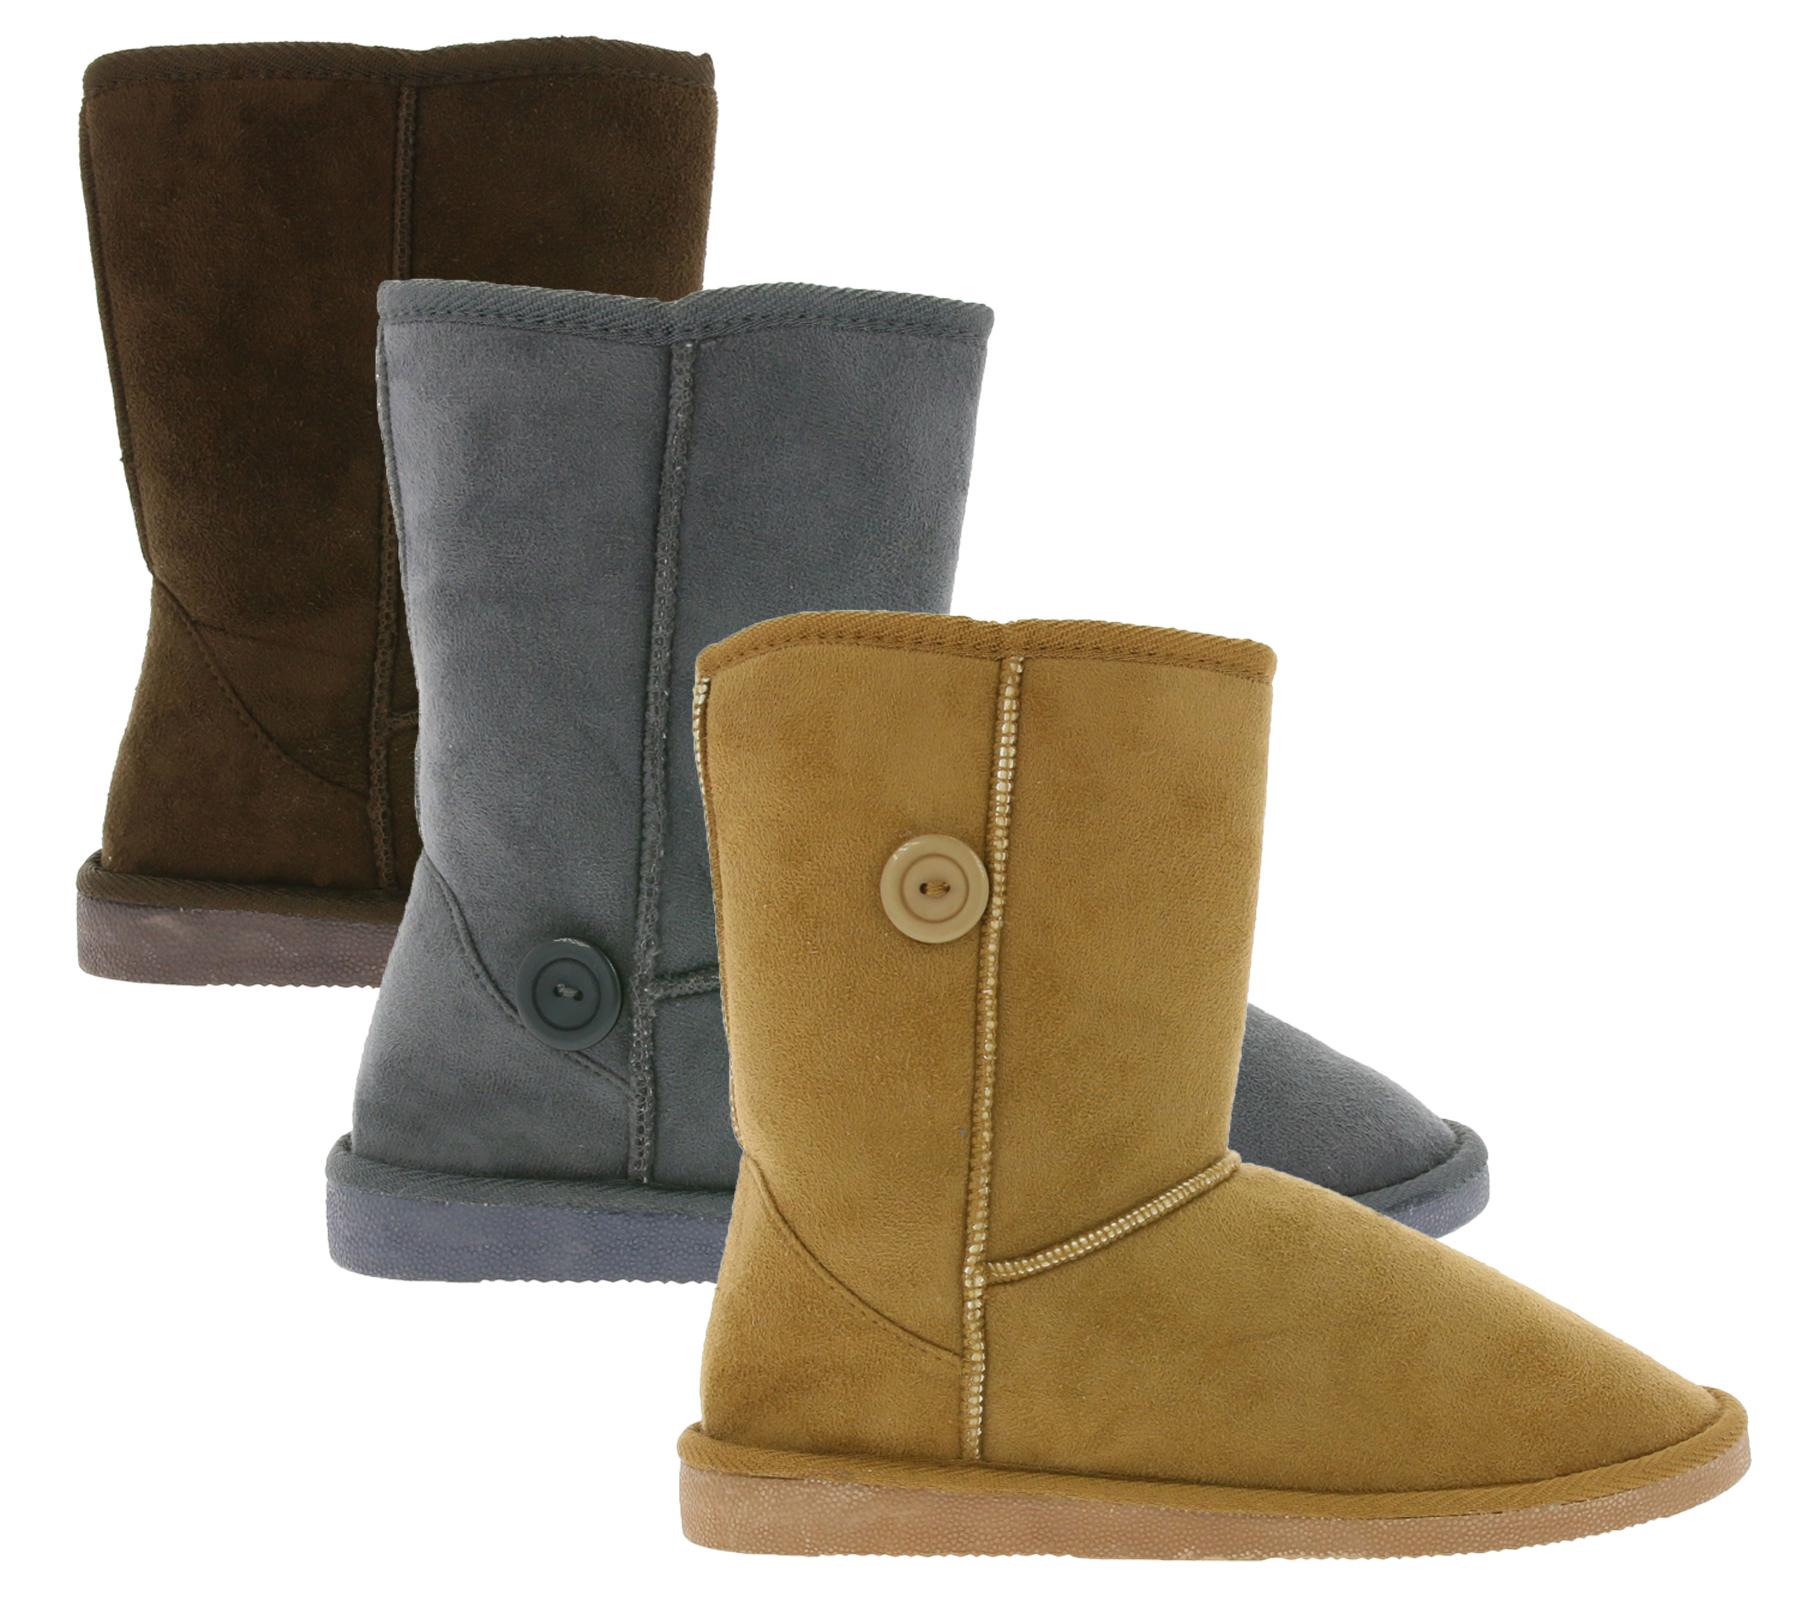 Winter Boots Marke Zapato versch. Farben  Gr. 37-41 ähnlich Ugg Boots (Outlet 46)